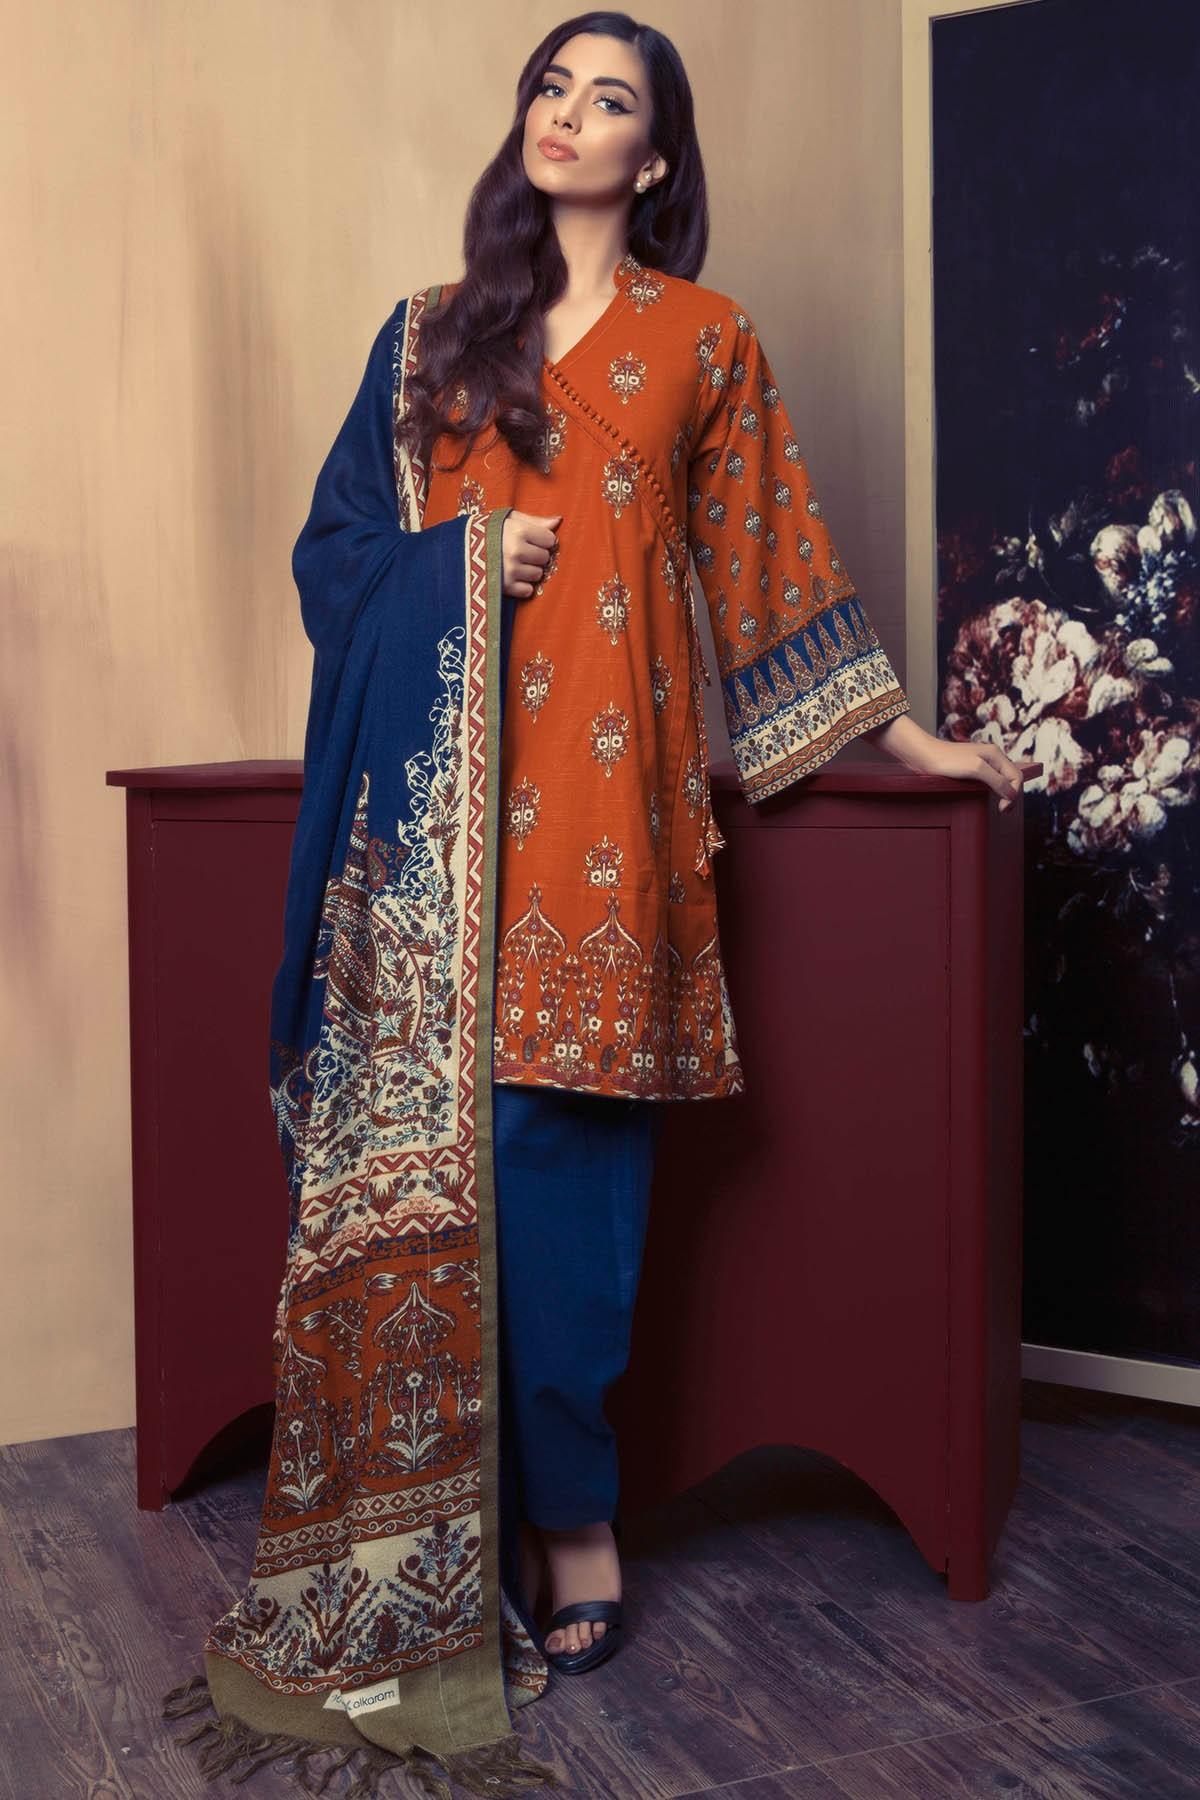 824bfde613a9a Alkaram Textile Pashmina Woolen Shawl Collection For Fall/Winter 2017